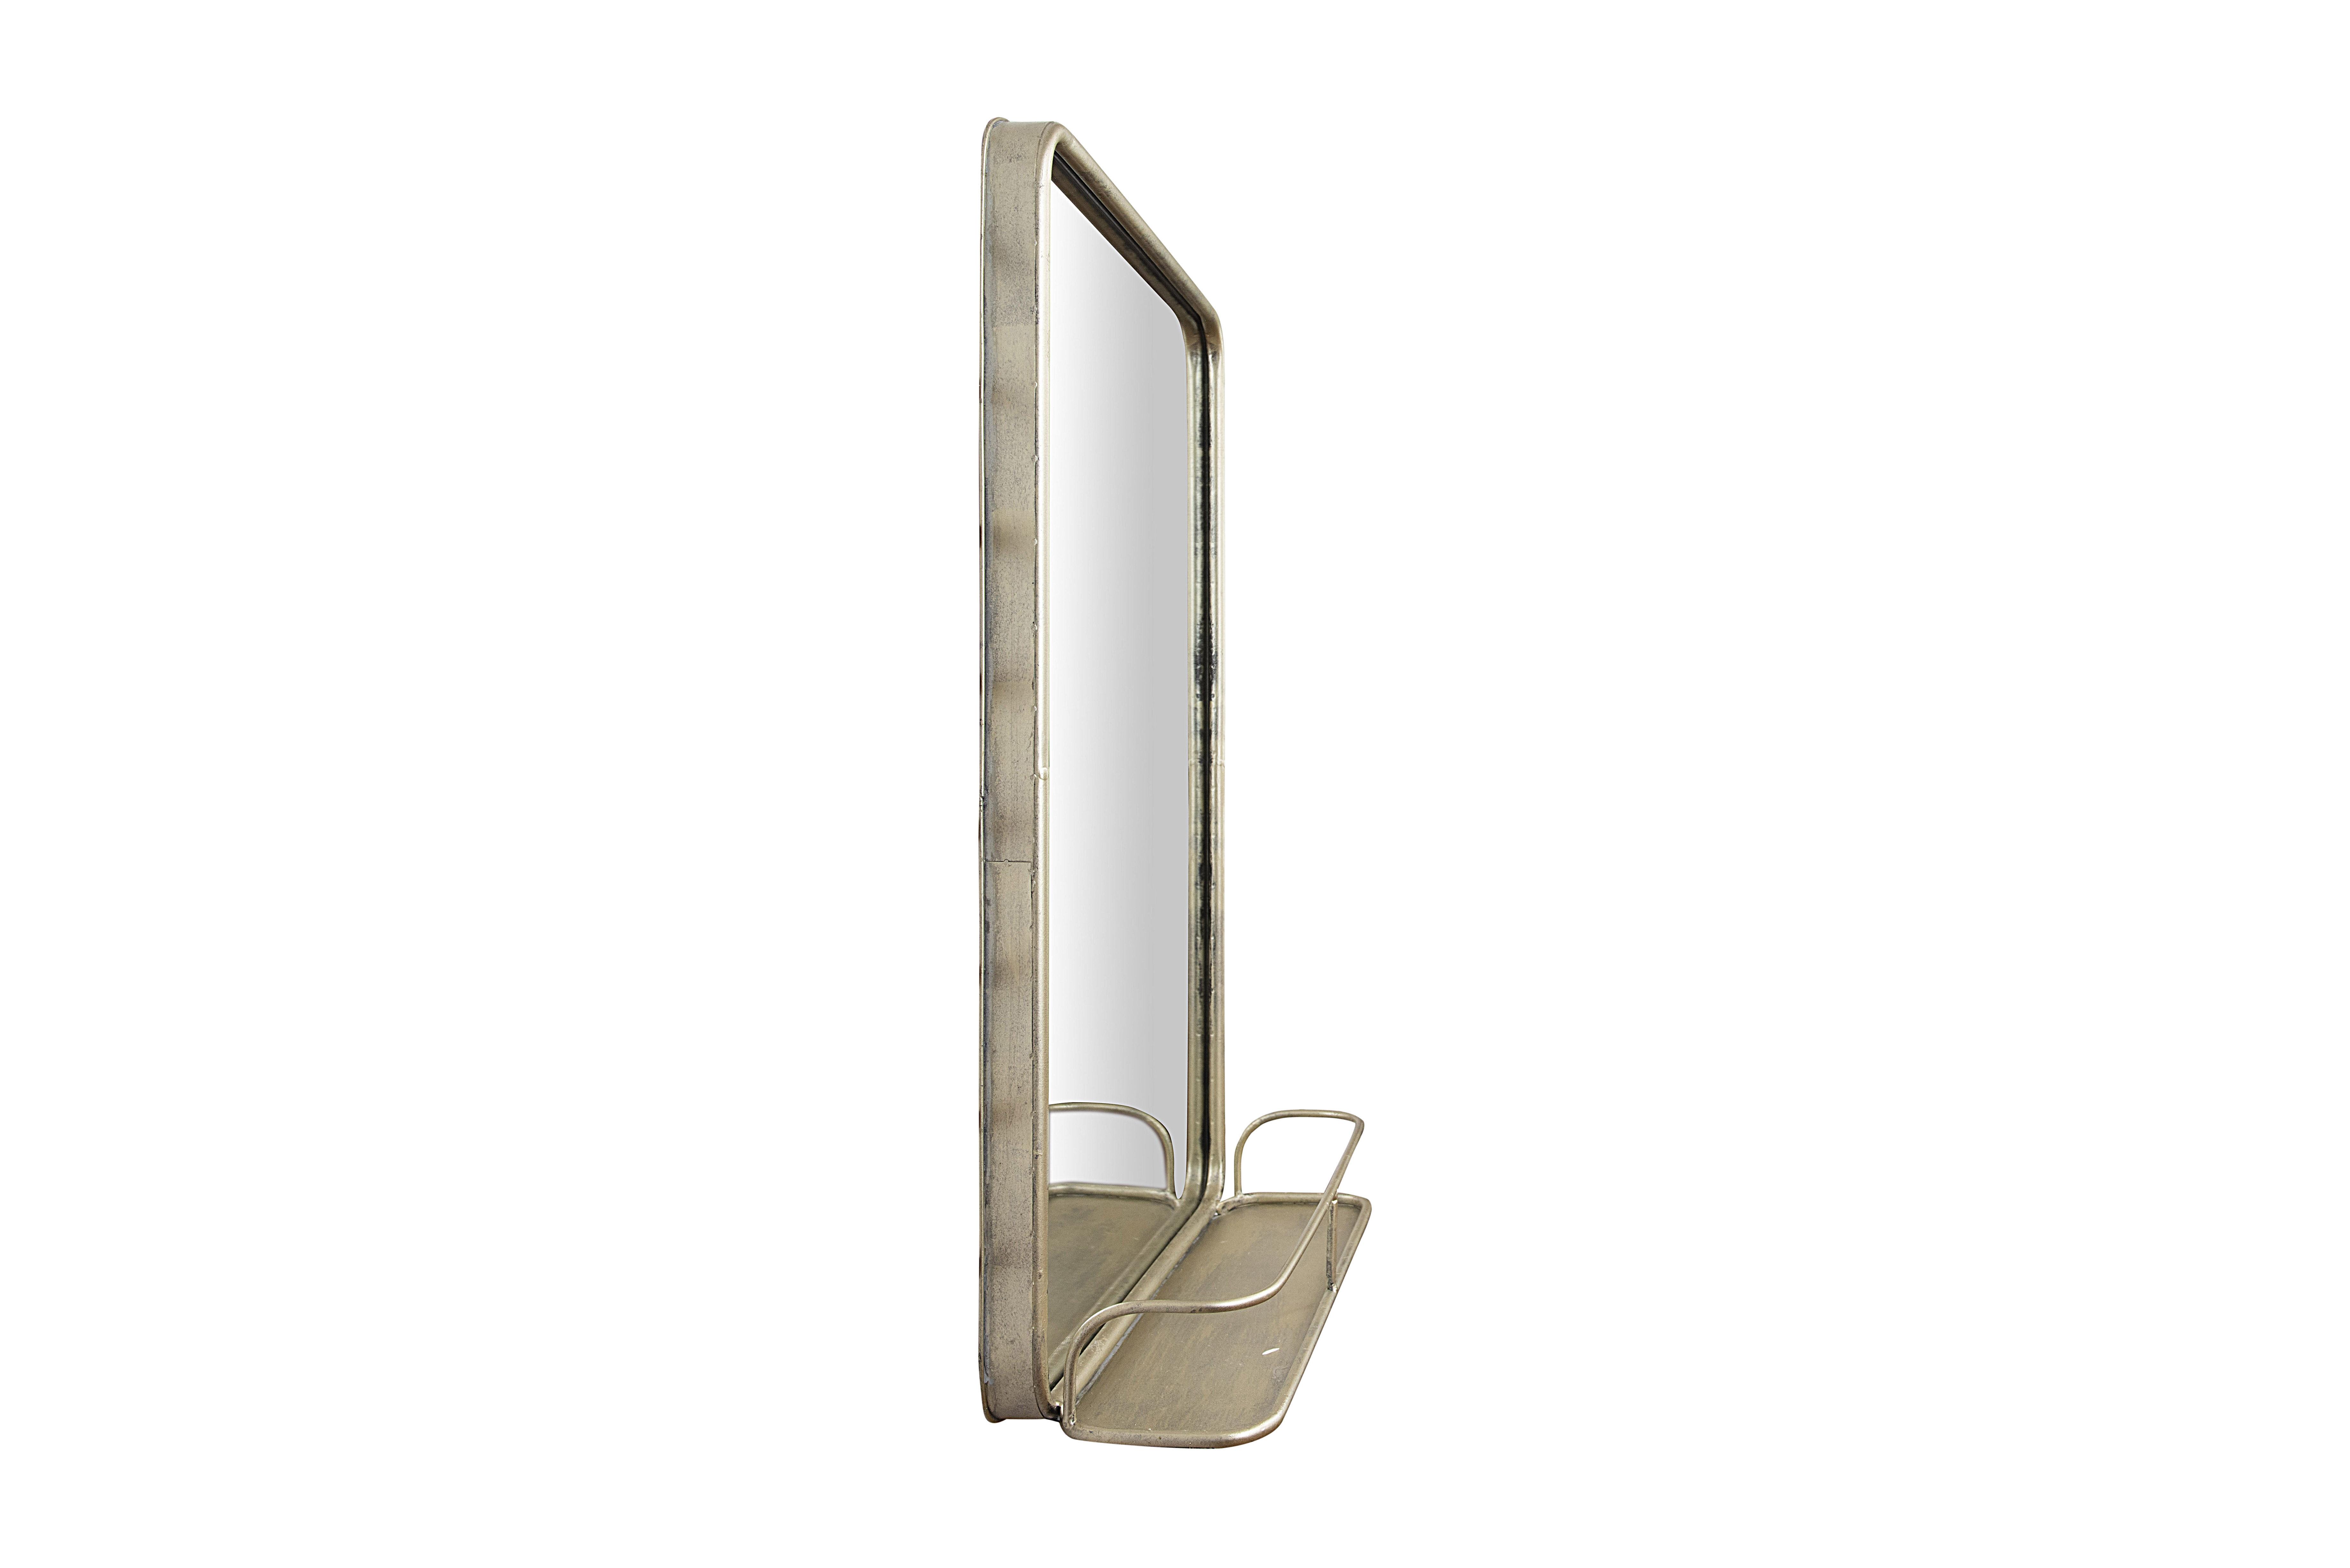 Peetz Modern Rustic Accent Mirror Pertaining To Peetz Modern Rustic Accent Mirrors (View 7 of 30)